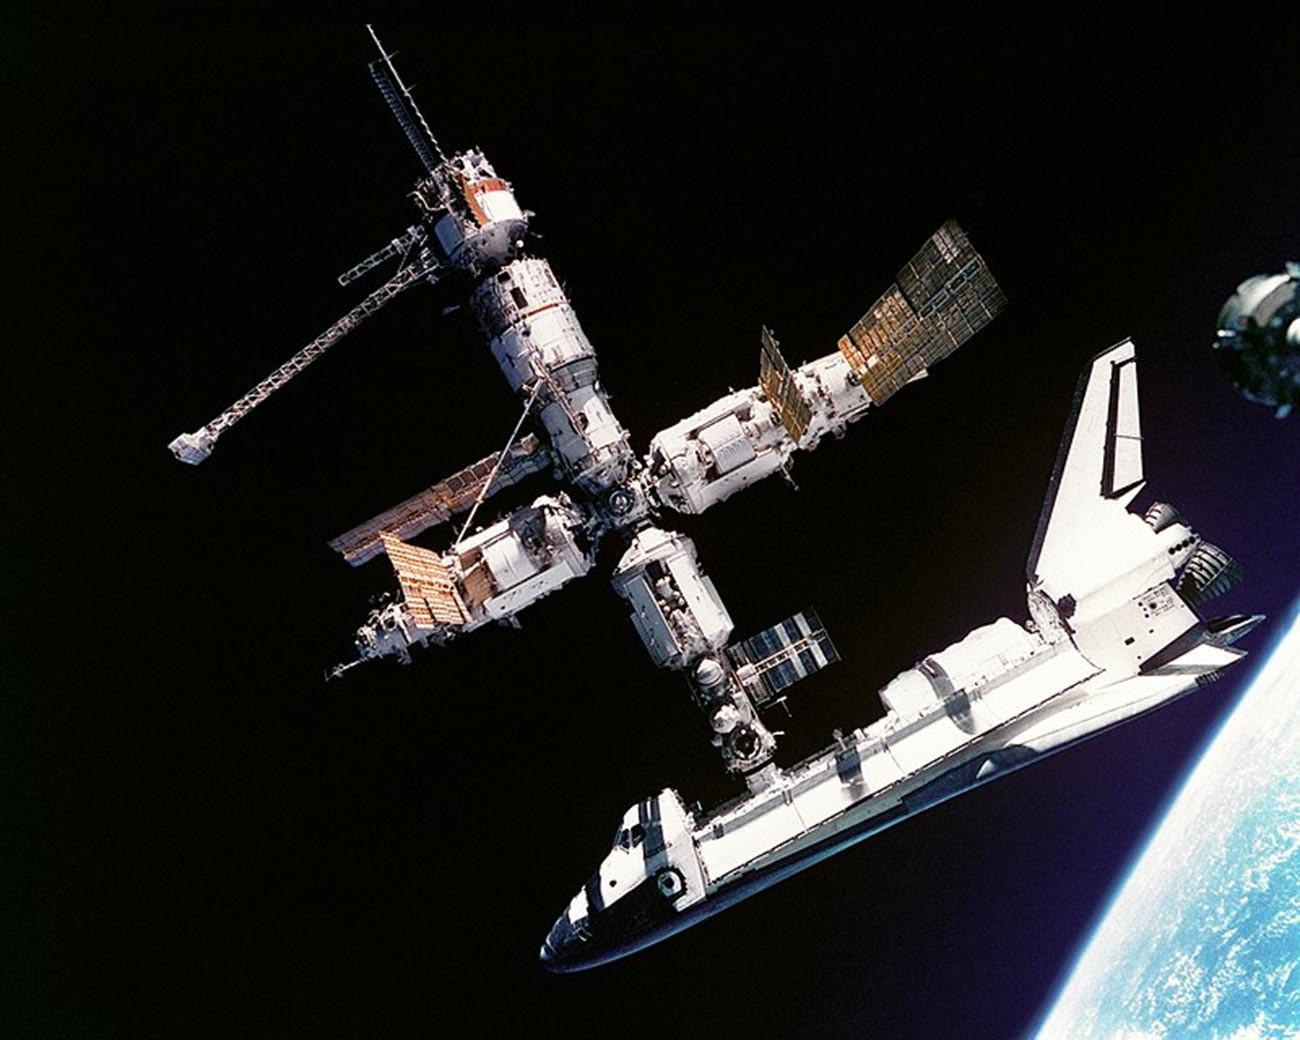 Pemandangan Pesawat Ulang-Alik Atlantis yang masih terhubung ke Stasiun Luar Angkasa Mir Rusia ini difoto oleh awak Mir-19 pada 4 Juli 1995.